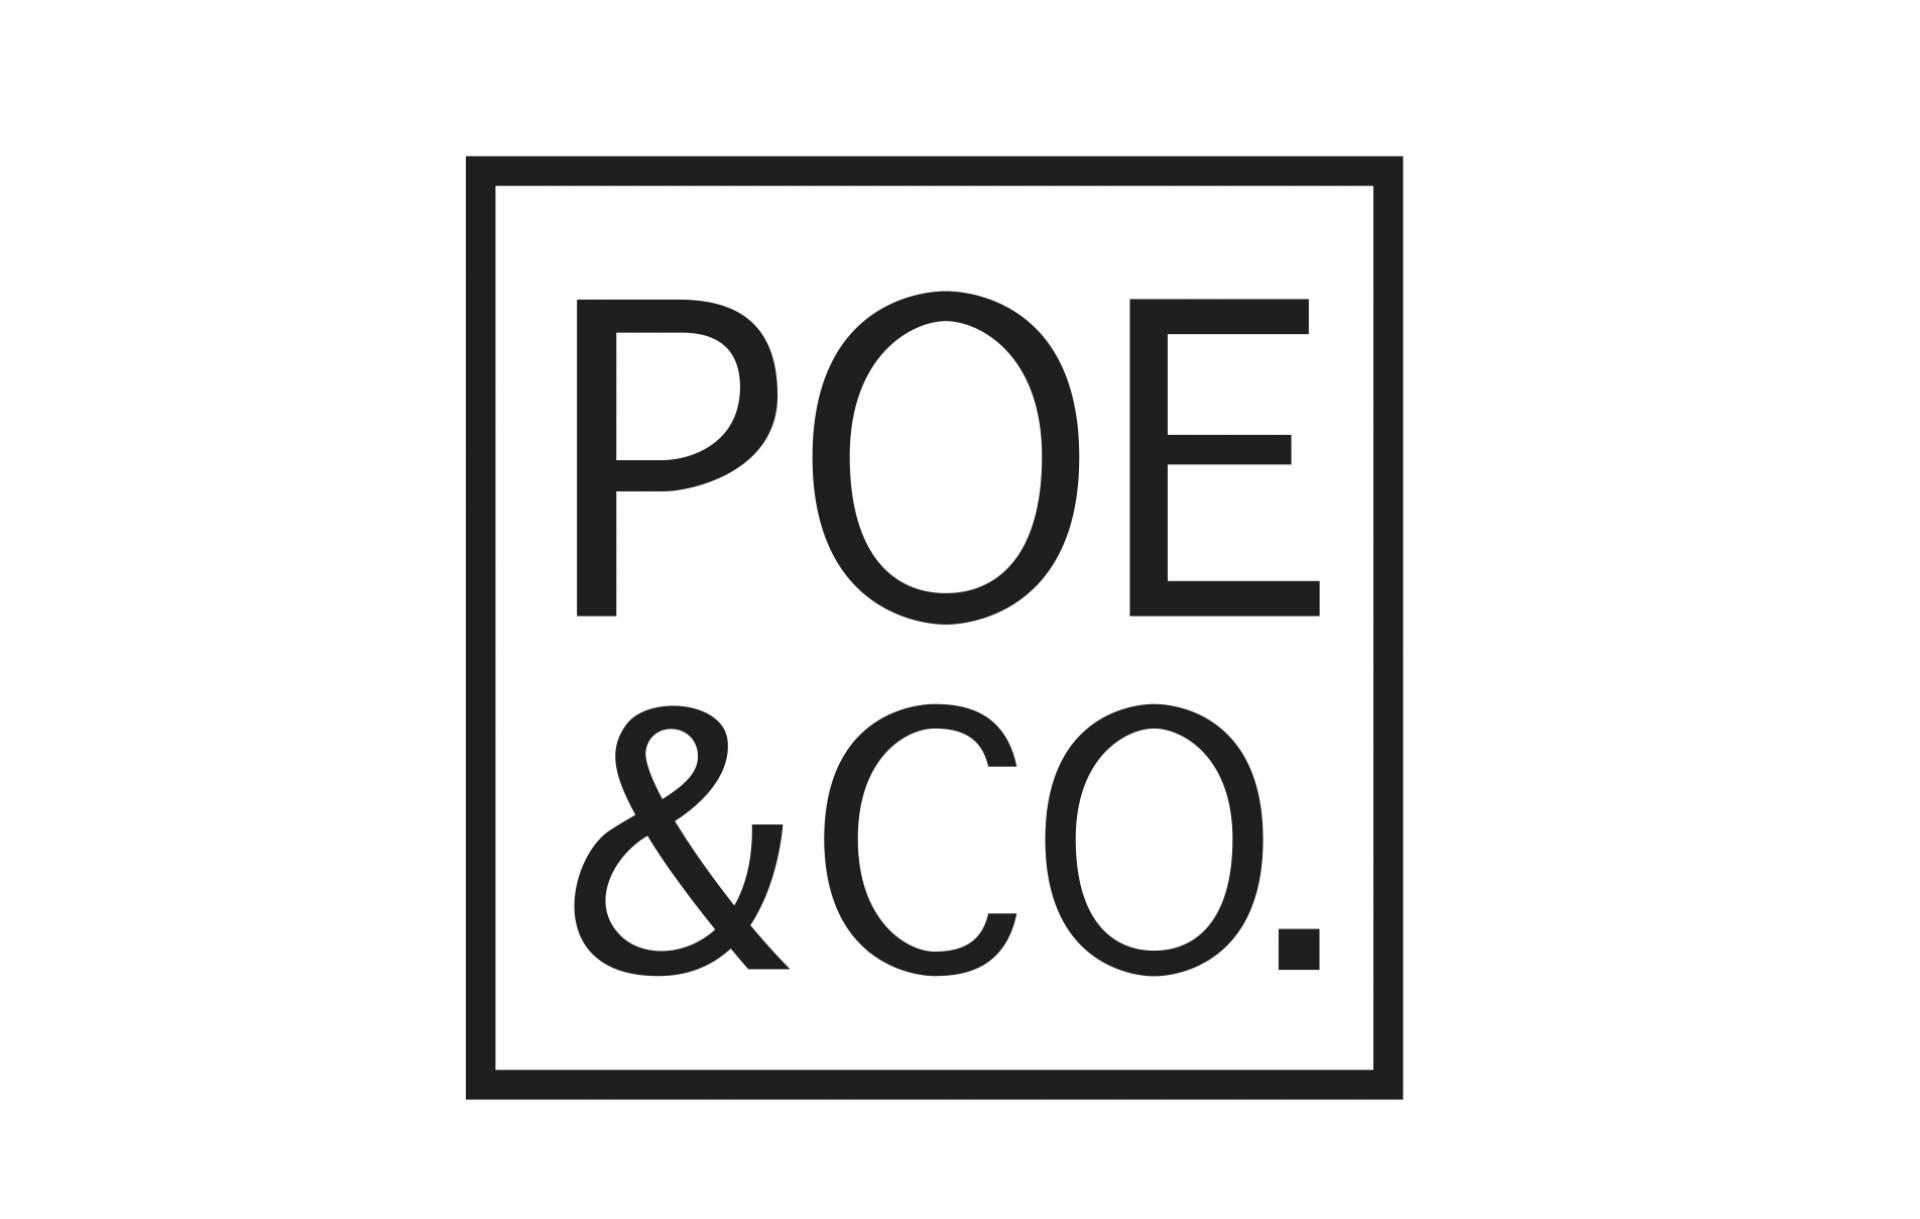 Poe & Co. logo